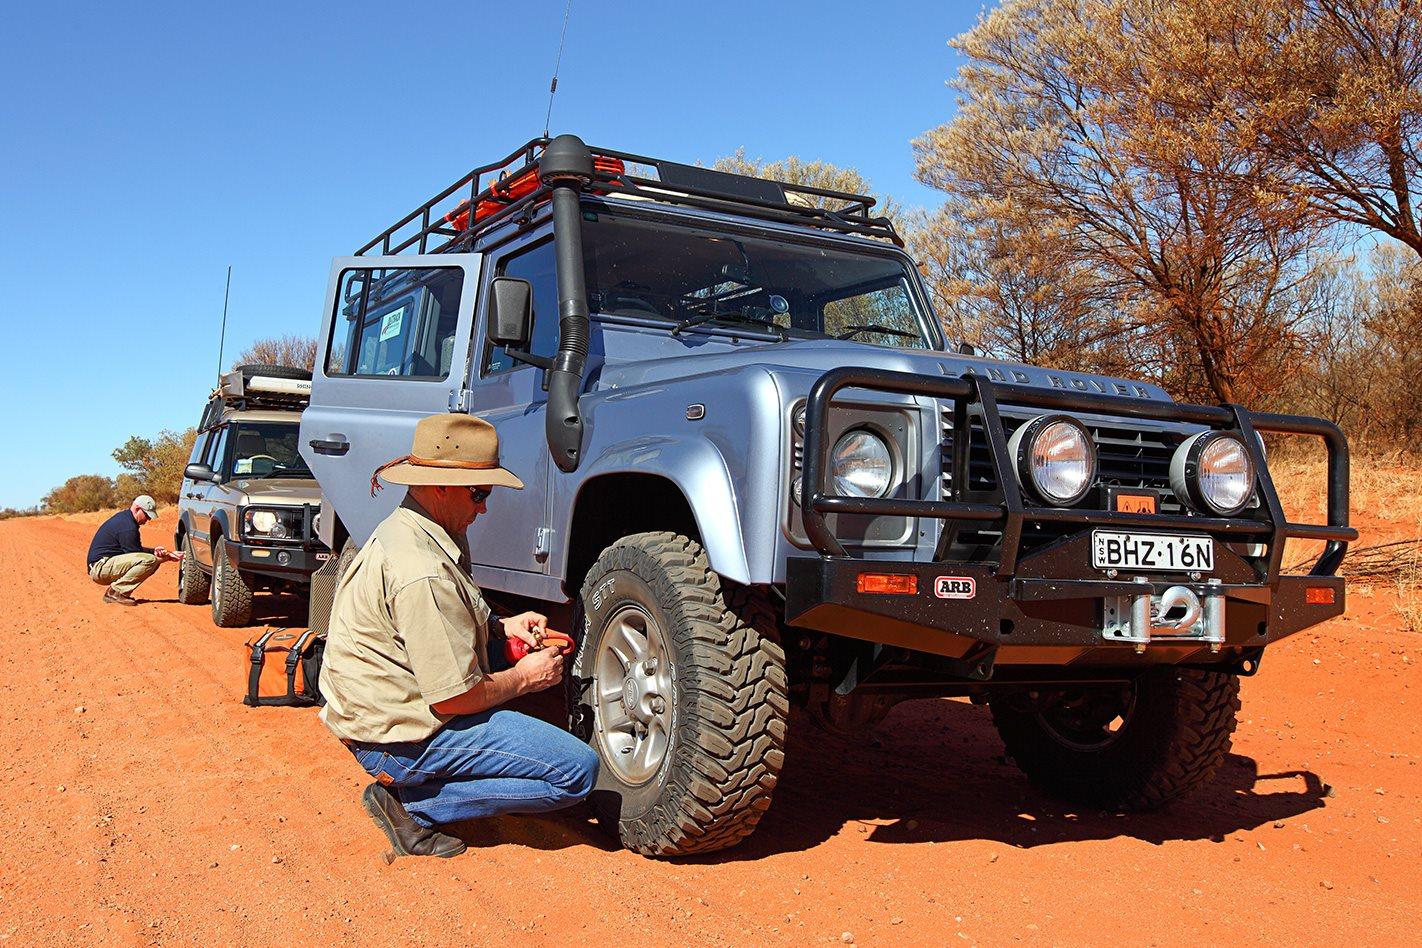 off road tyre guide 4x4 australia. Black Bedroom Furniture Sets. Home Design Ideas